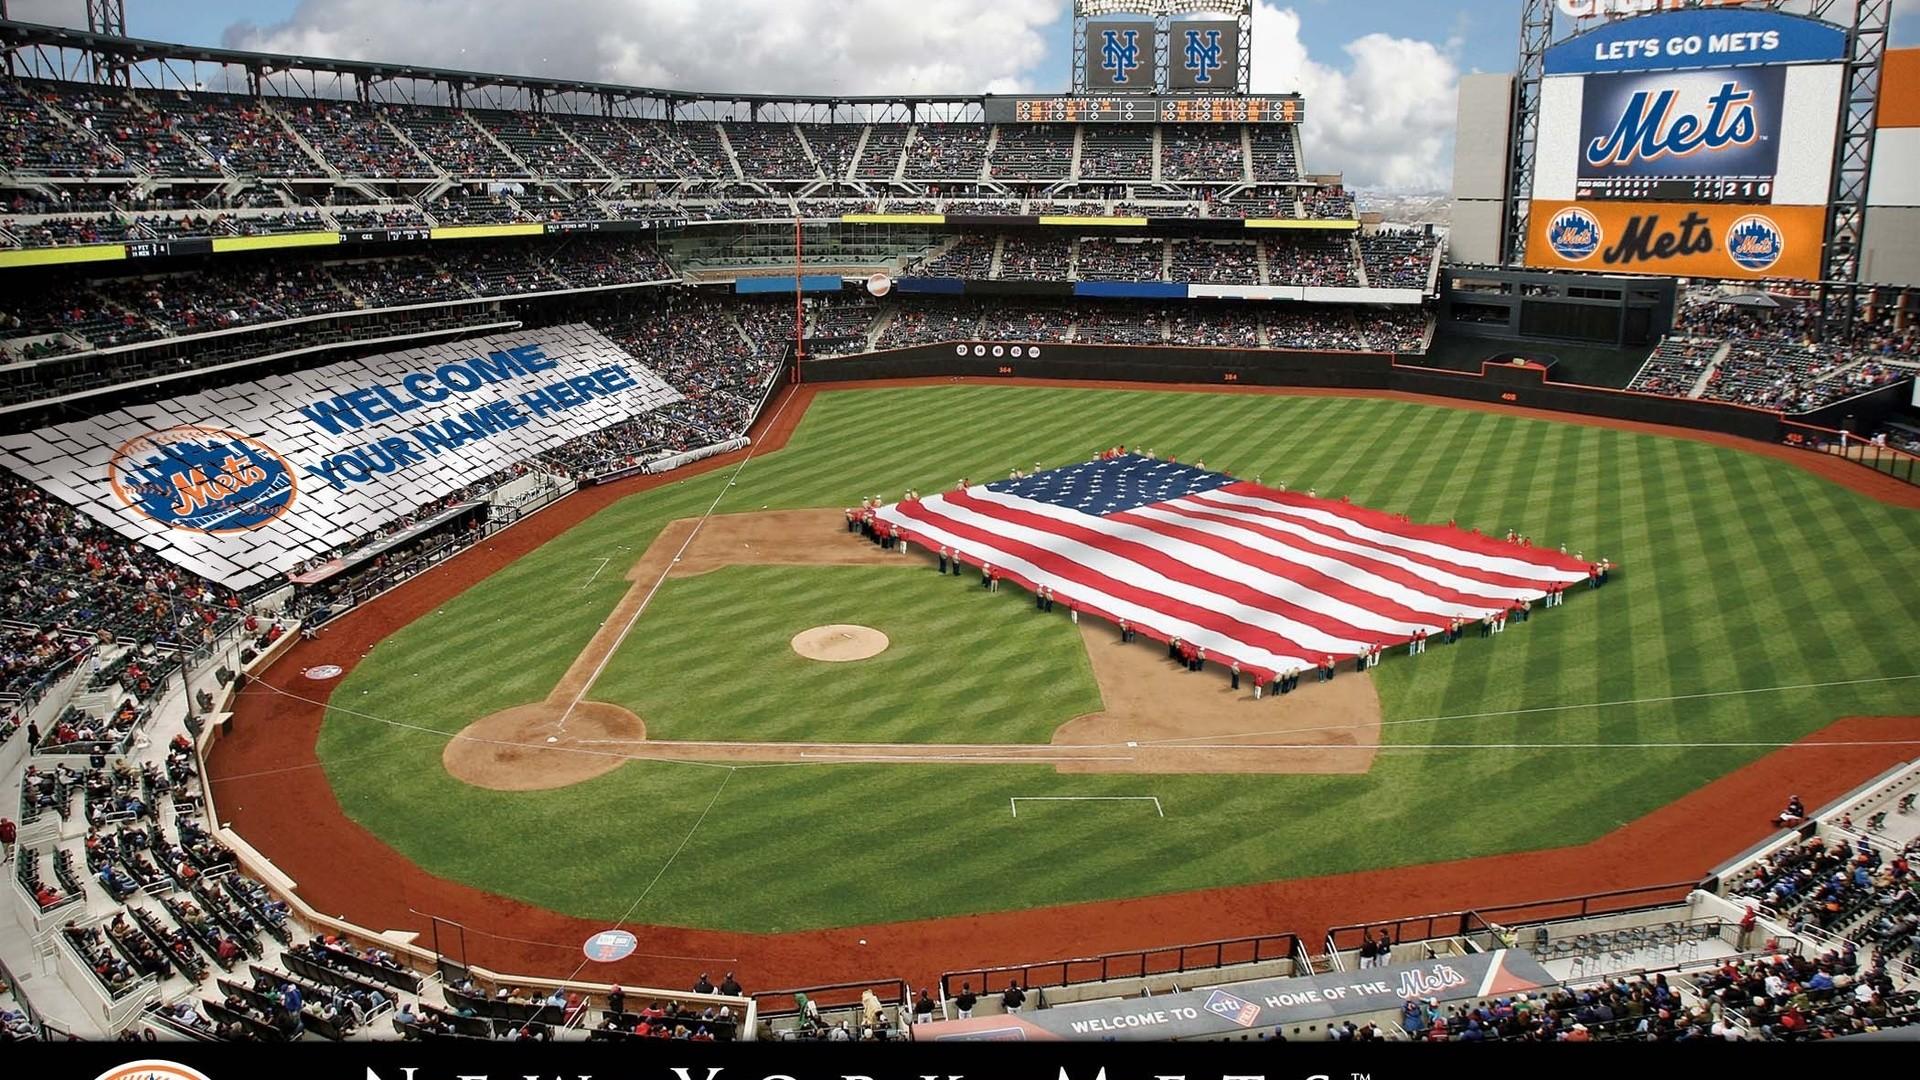 New York Mets, Stadium, New York Mets Baseball Stadium, Baseball, Sports,